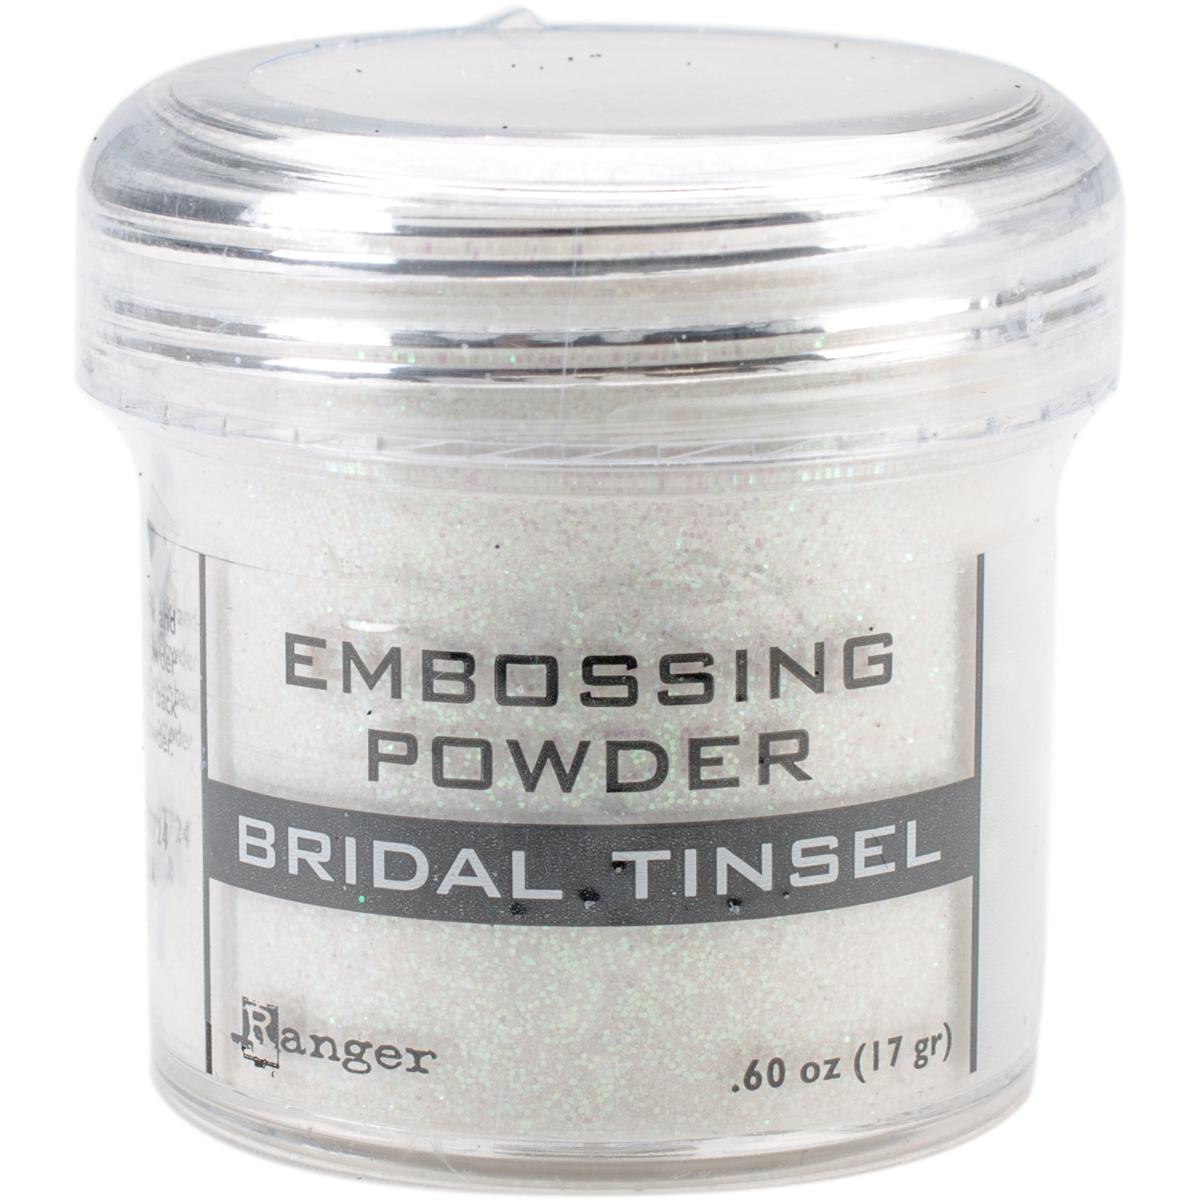 BRIDA; TINSEL-EMBOSSING POWDER 1 OZ